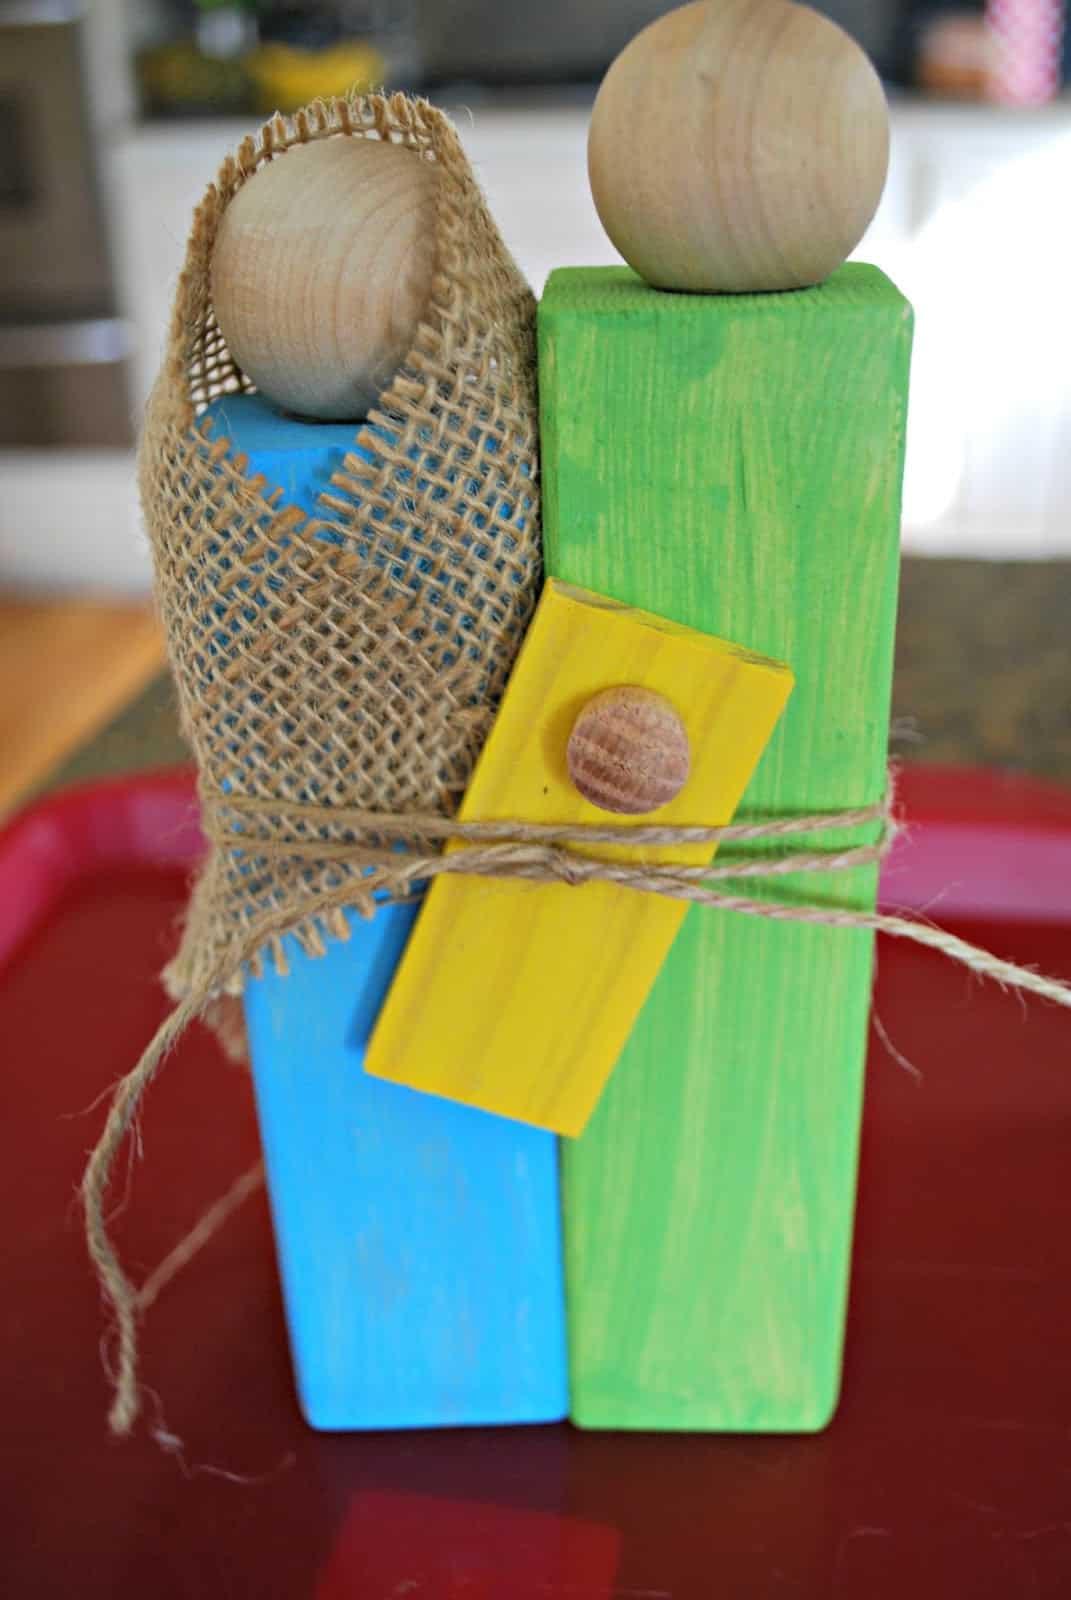 Homemade Christmas Gifts - Wooden Nativity Craft - Mess ...